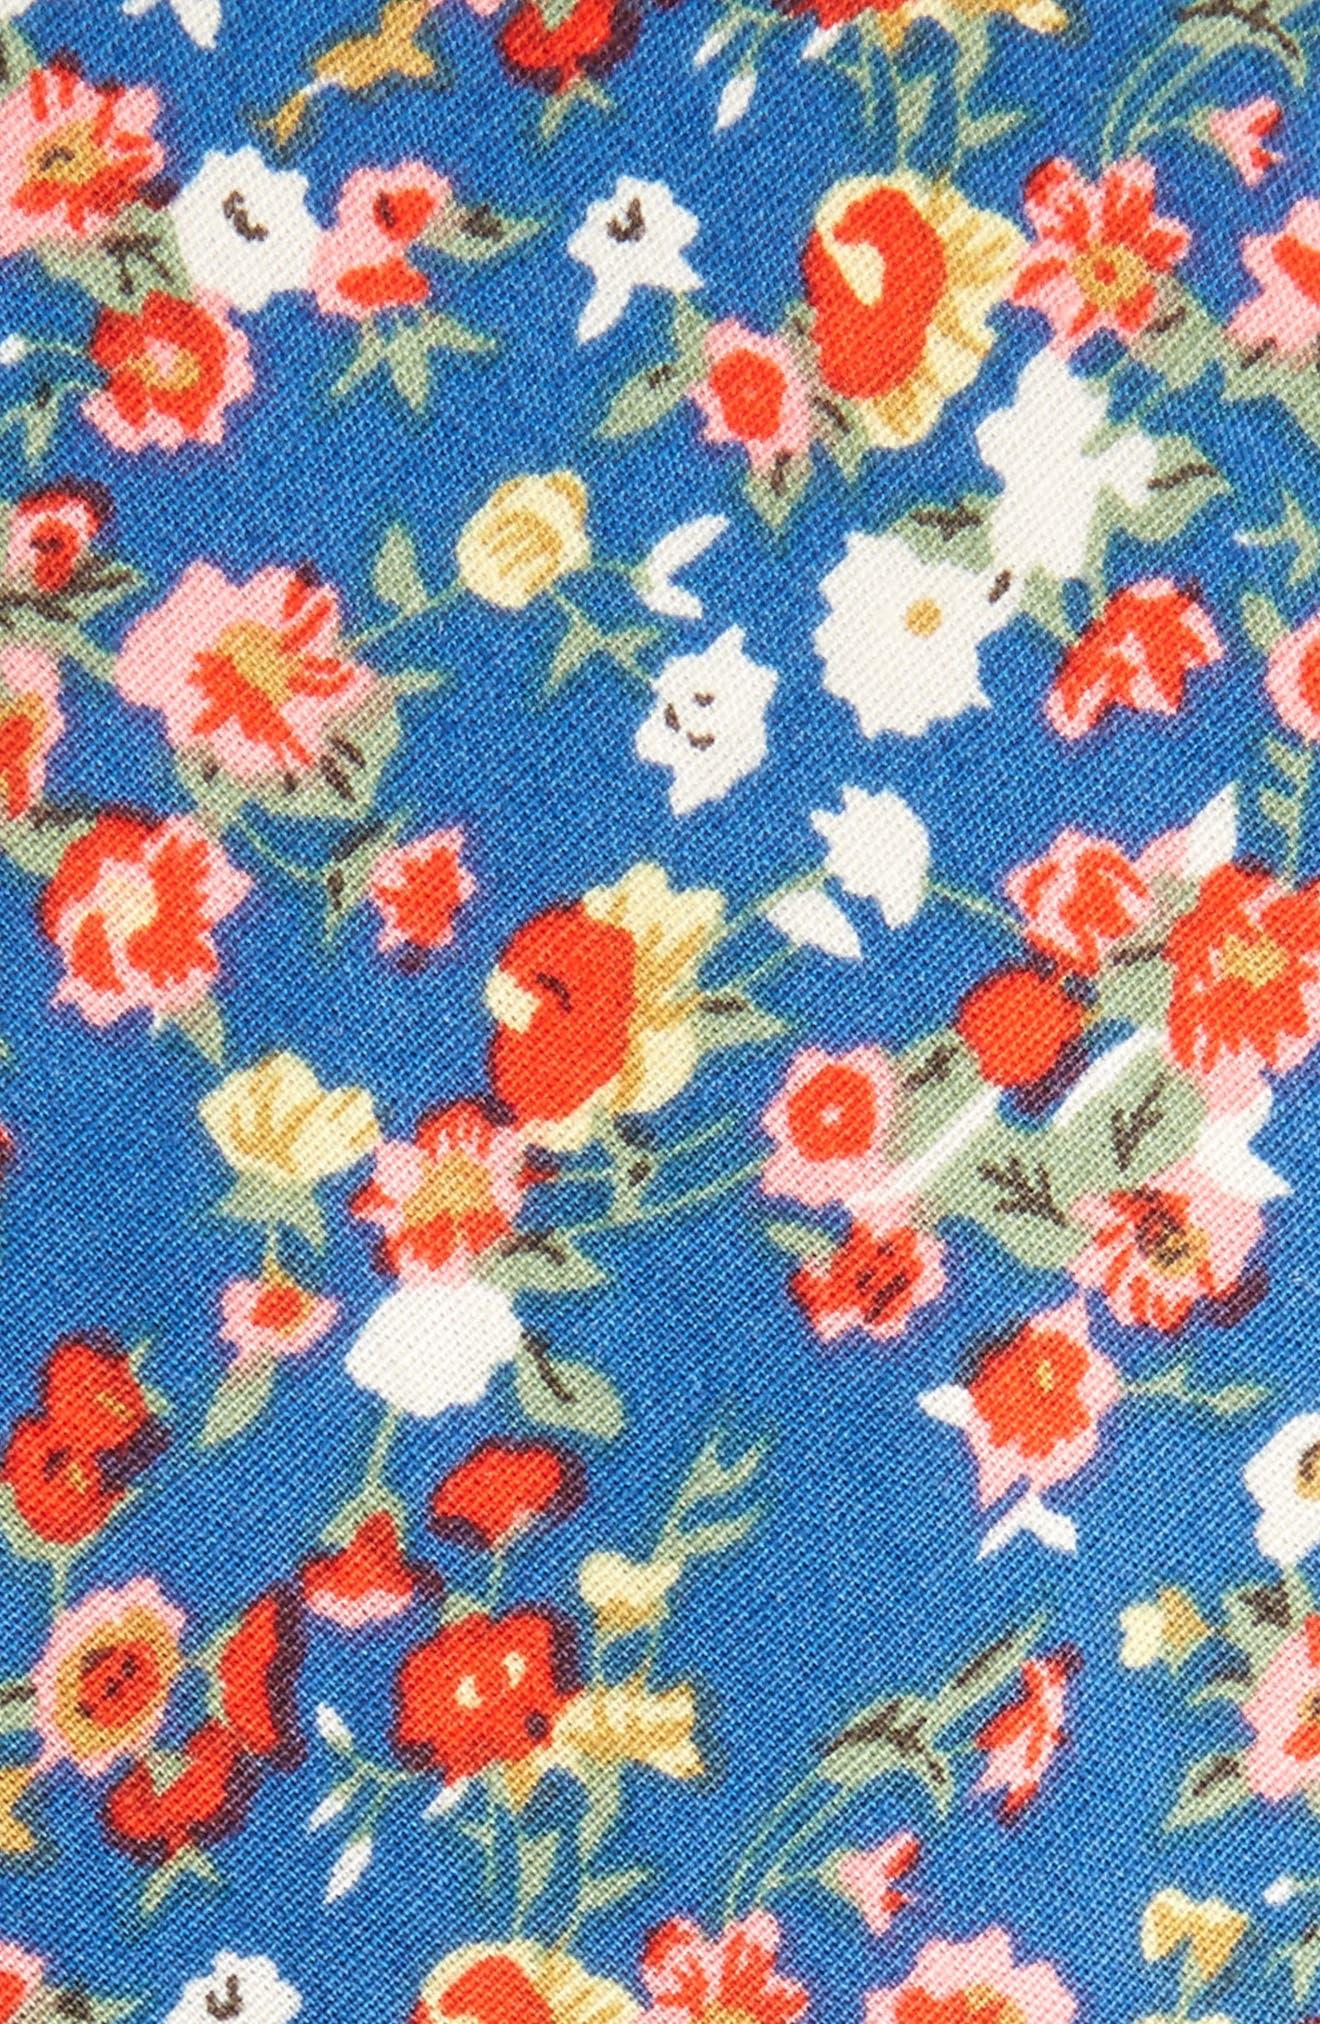 Brayfield Floral Cotton Skinny Tie,                             Alternate thumbnail 2, color,